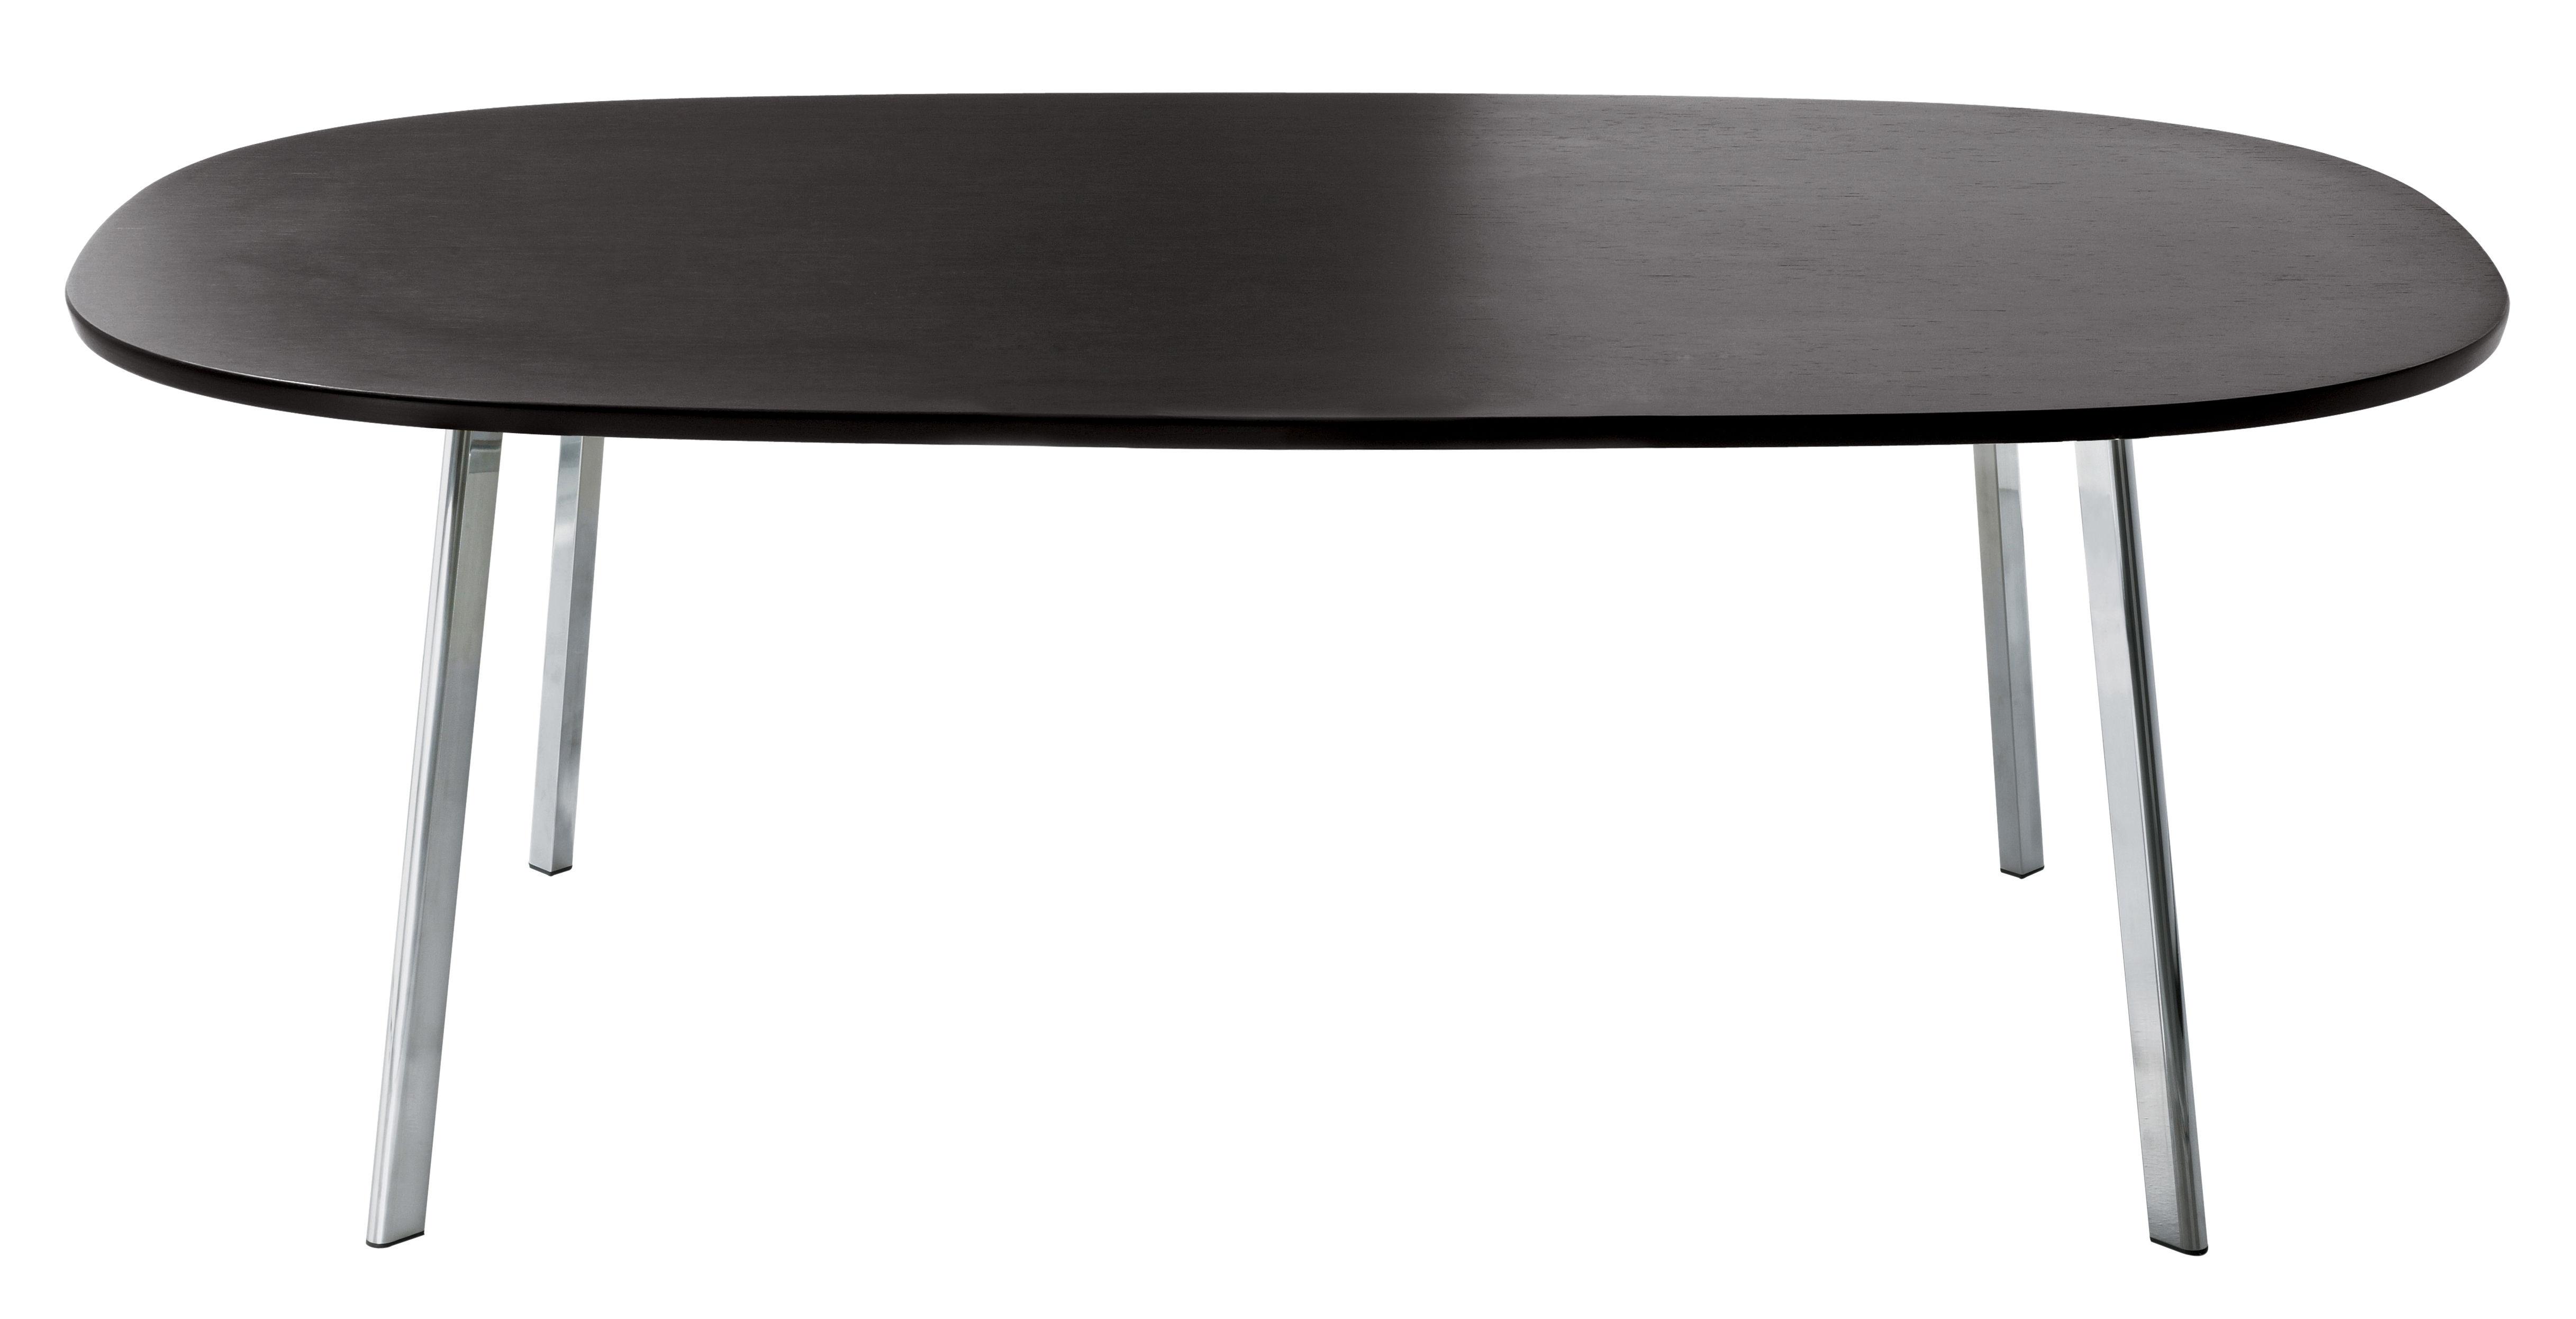 Furniture - Dining Tables - Déjà-vu Table - 200 cm by Magis - 210x120 - teinted wenge oak top - MDF veneer tinted oak, Polished aluminium